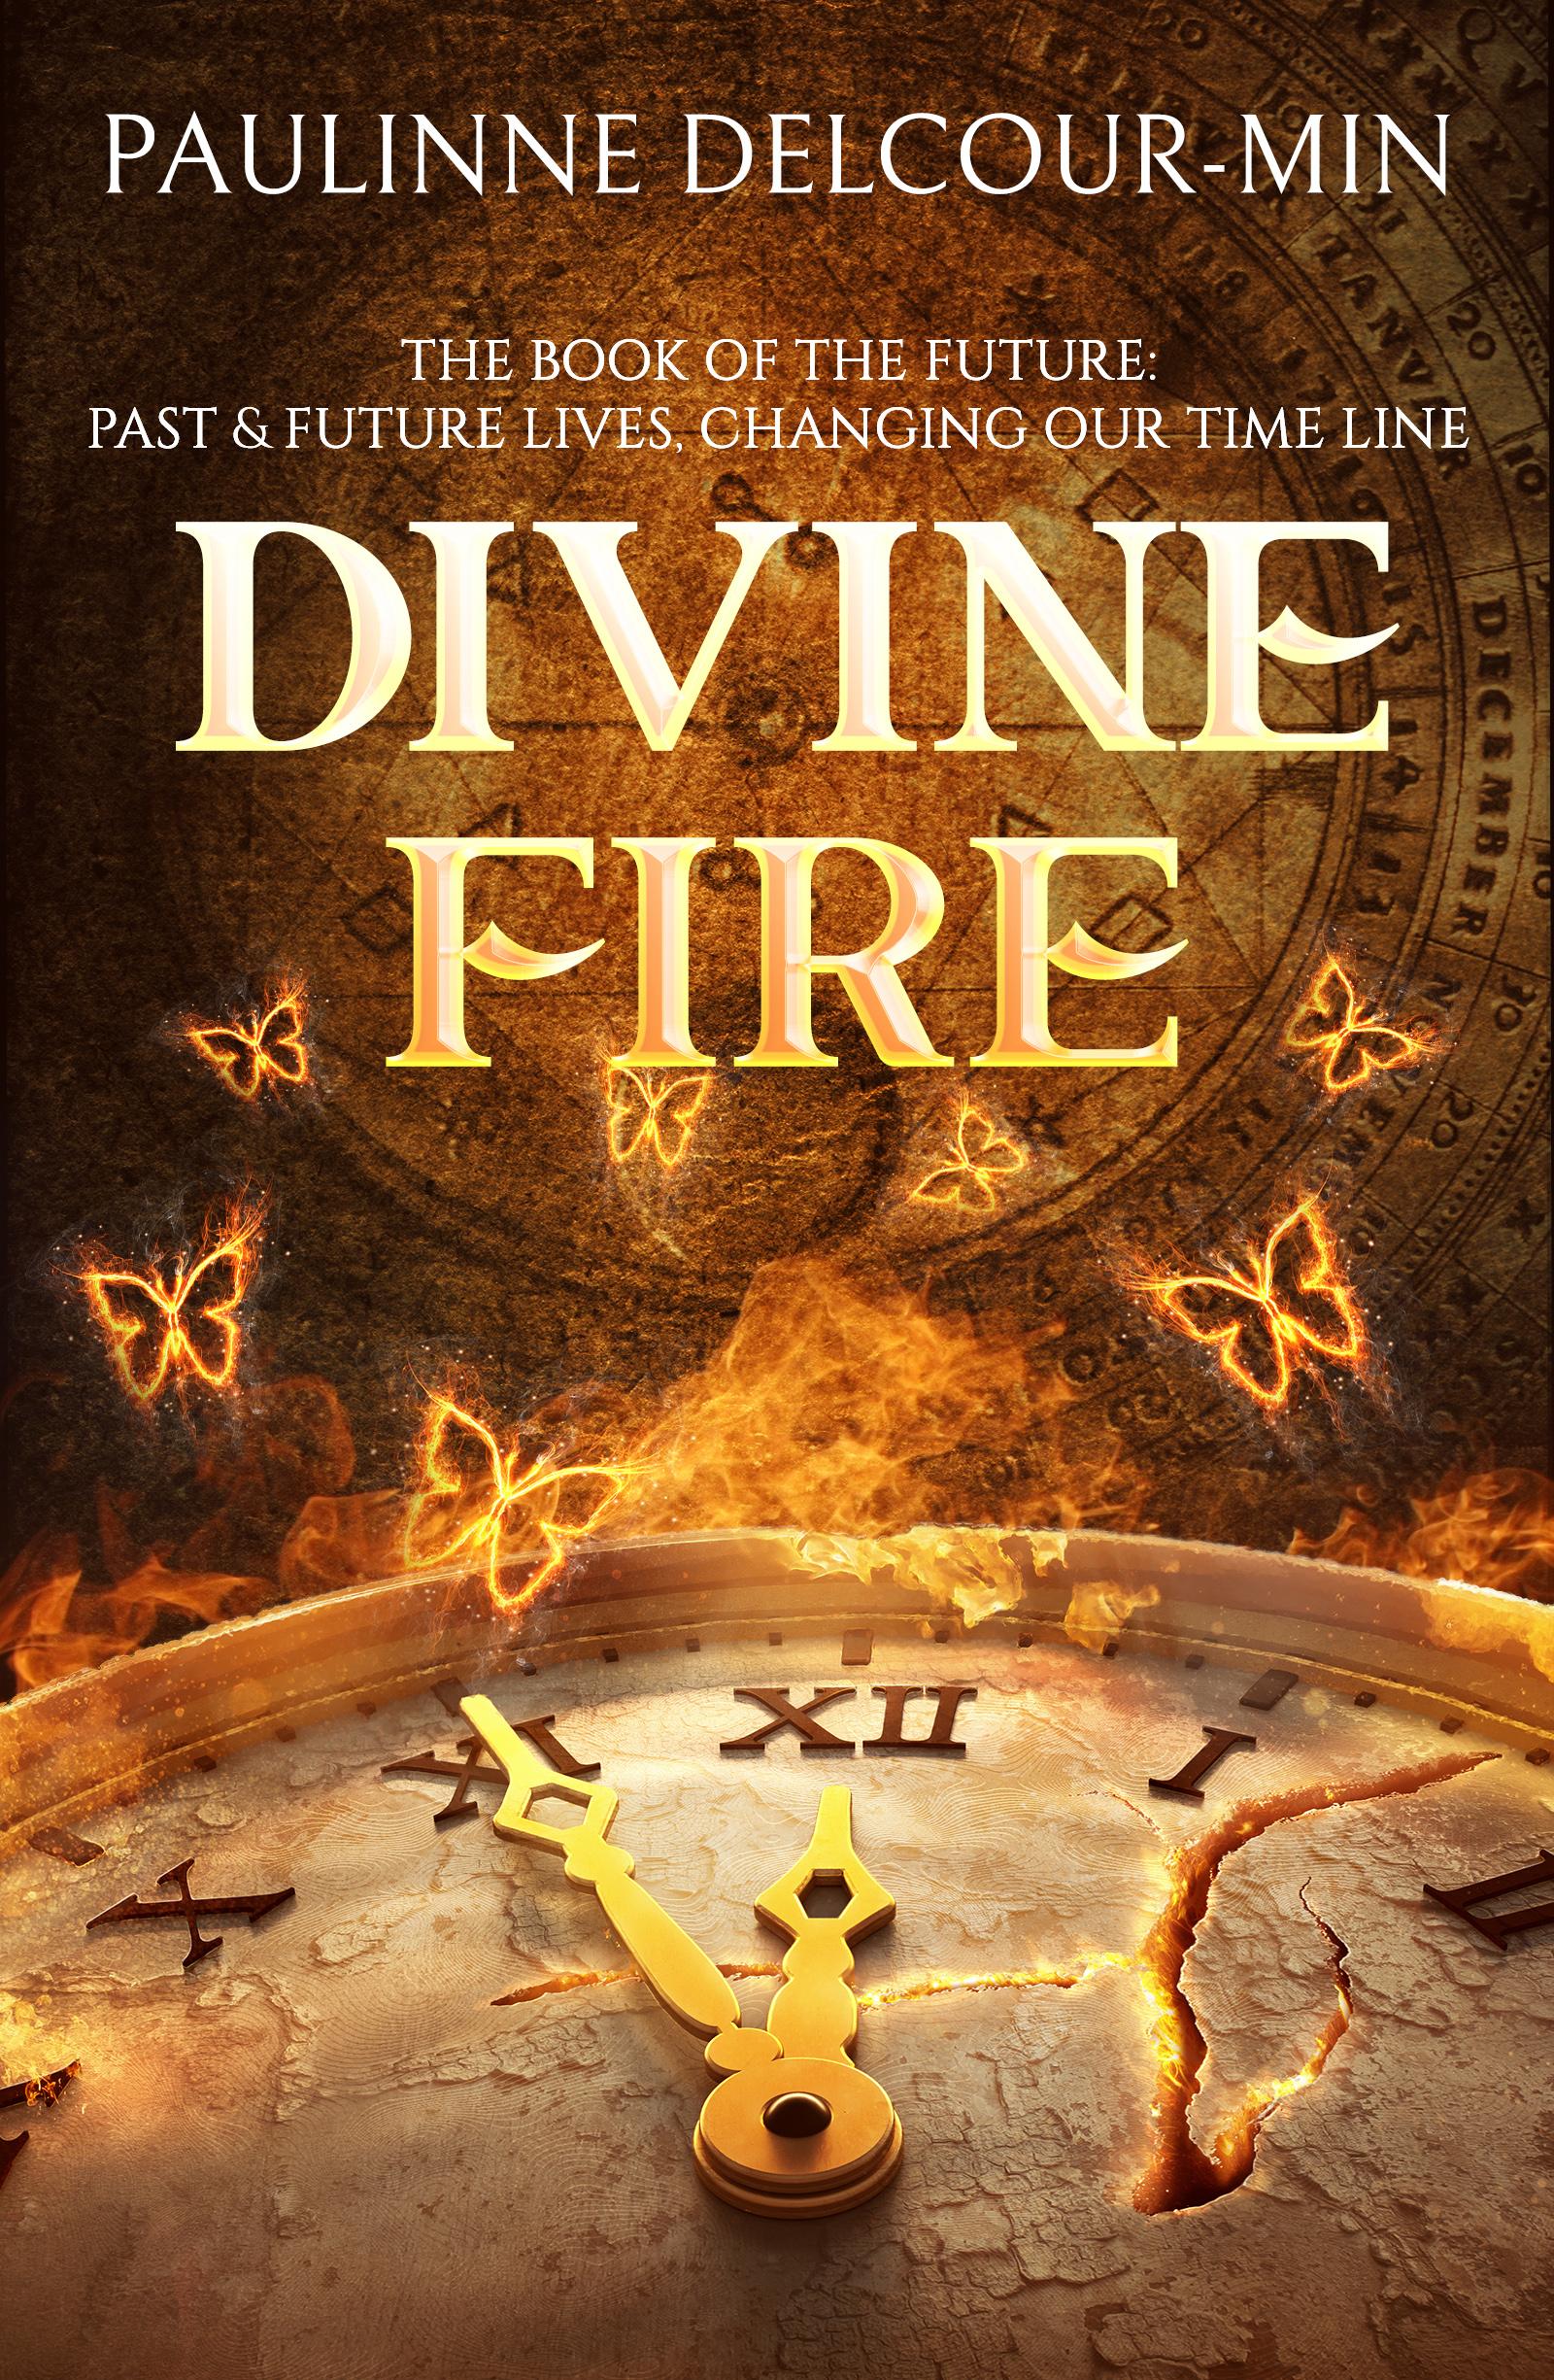 DivineFire